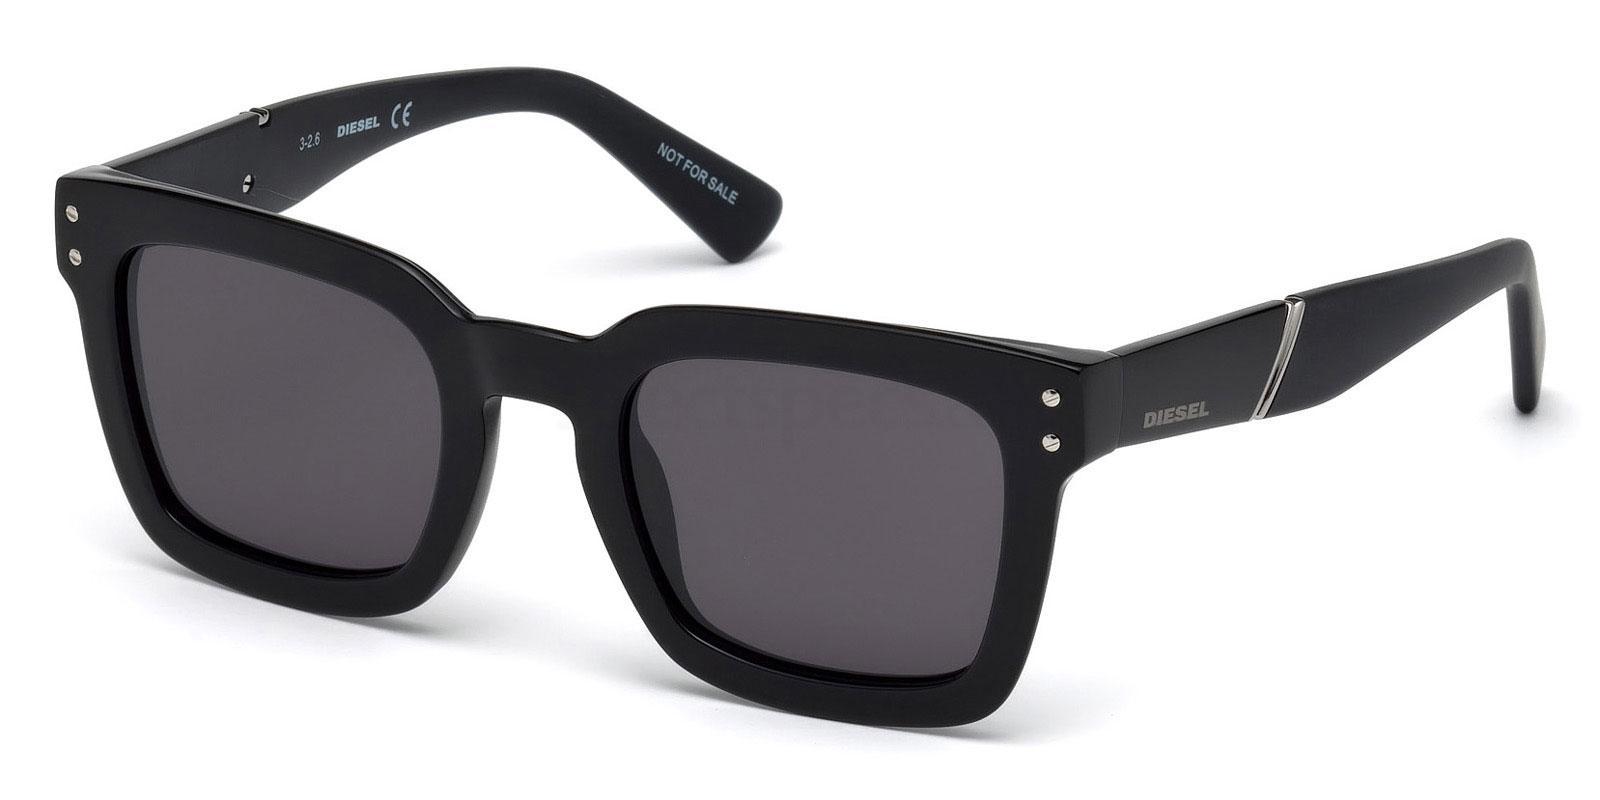 01A DL0229 Sunglasses, Diesel